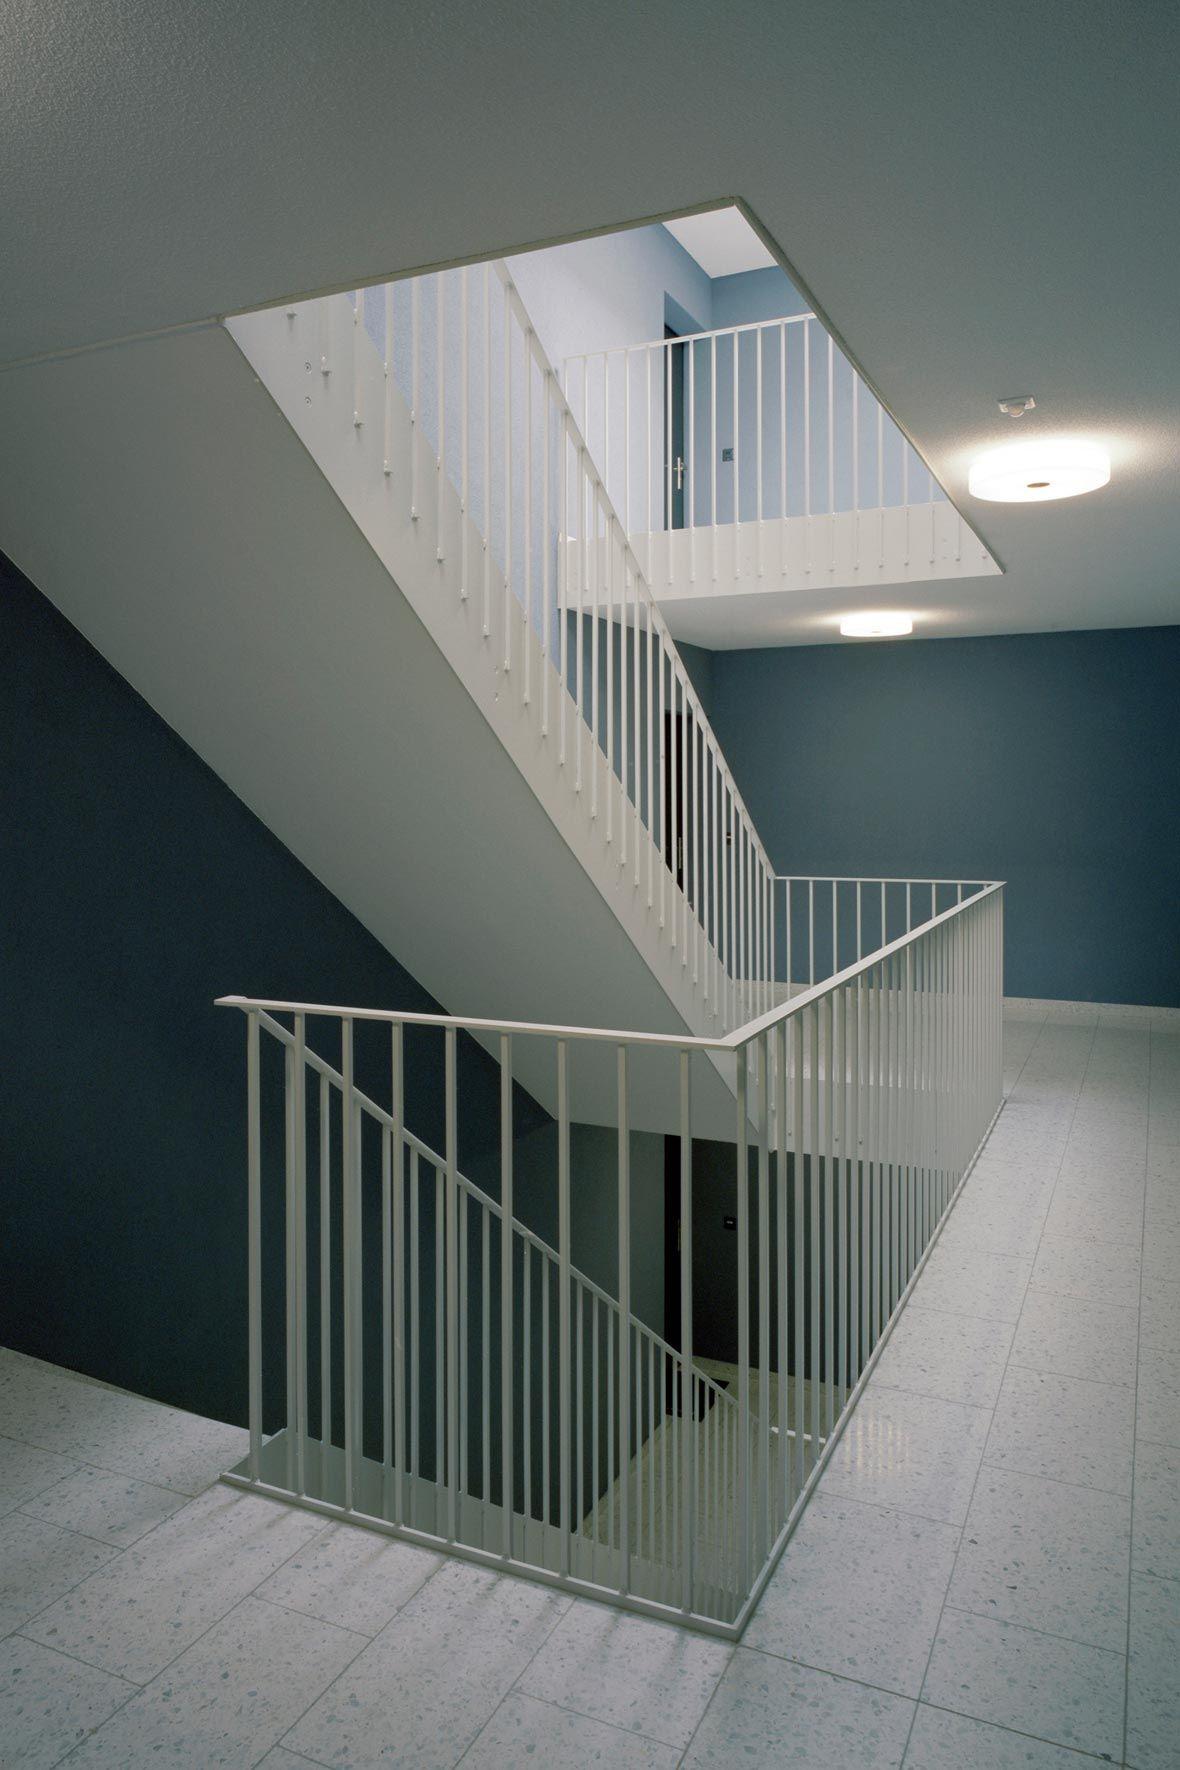 treppenhaus architecure photography pinterest treppenhaus treppe und gel nder. Black Bedroom Furniture Sets. Home Design Ideas